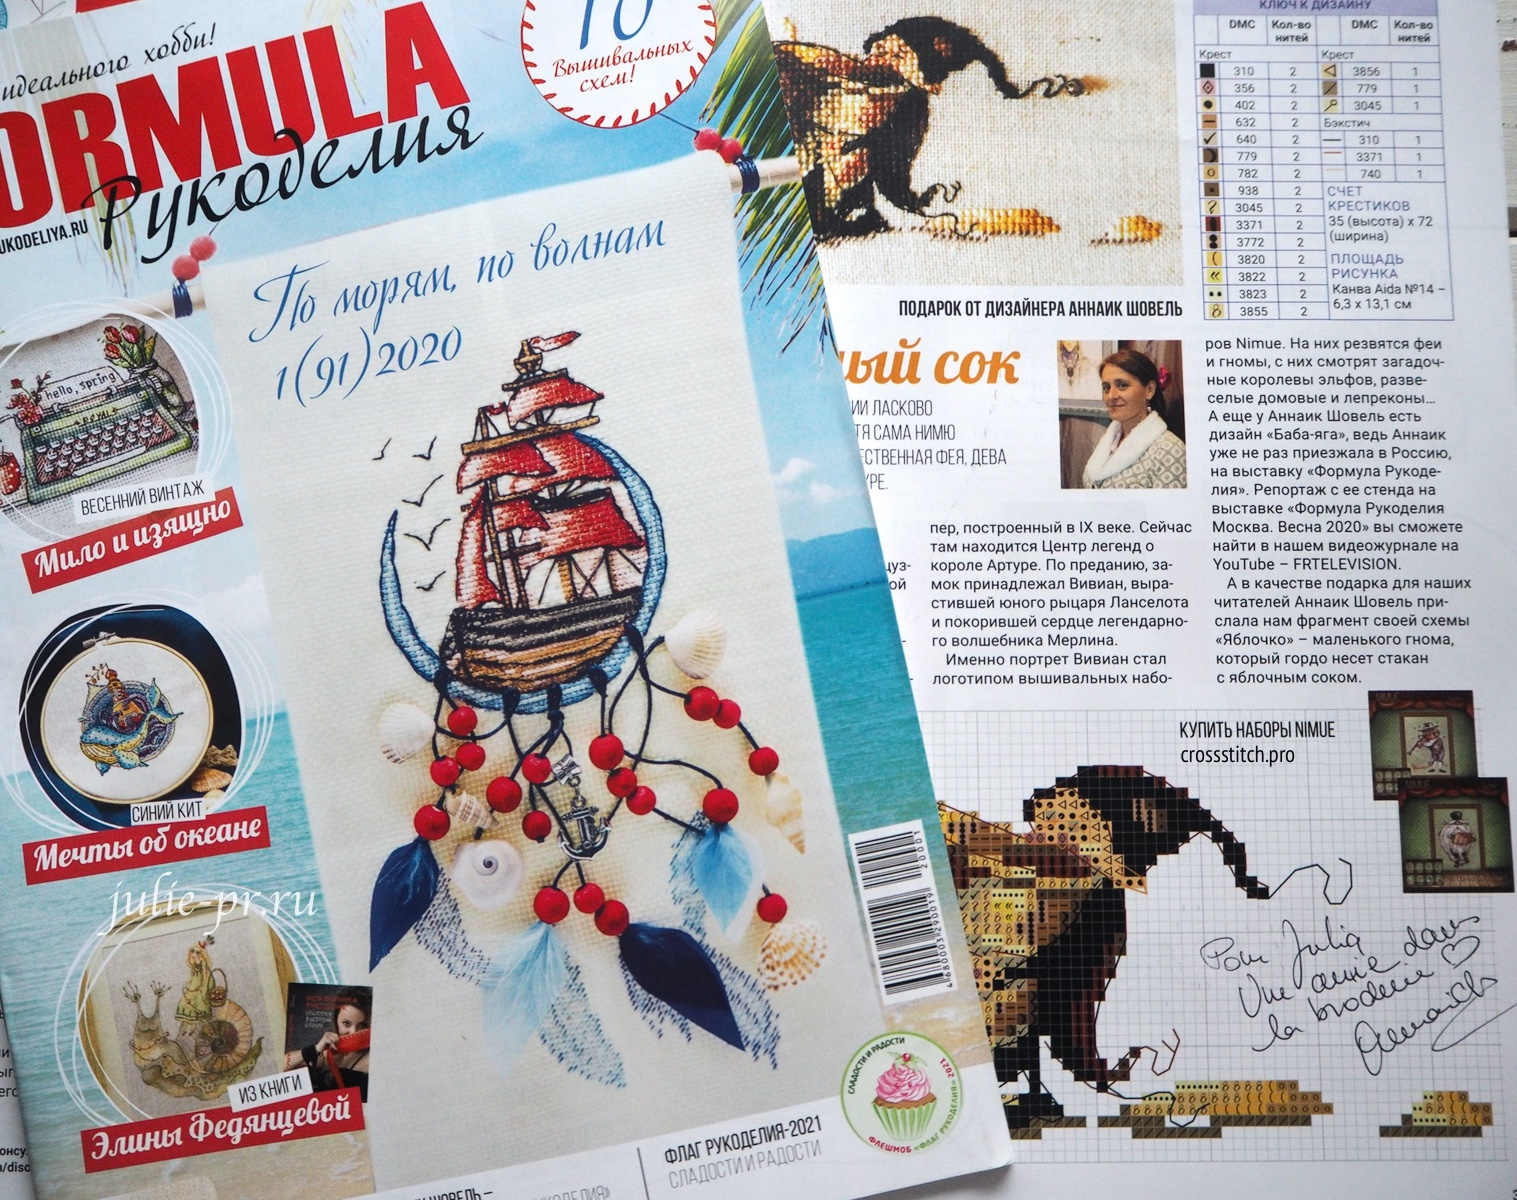 Автограф Annaick Chauvel, Nimue, журнал, формула рукоделия